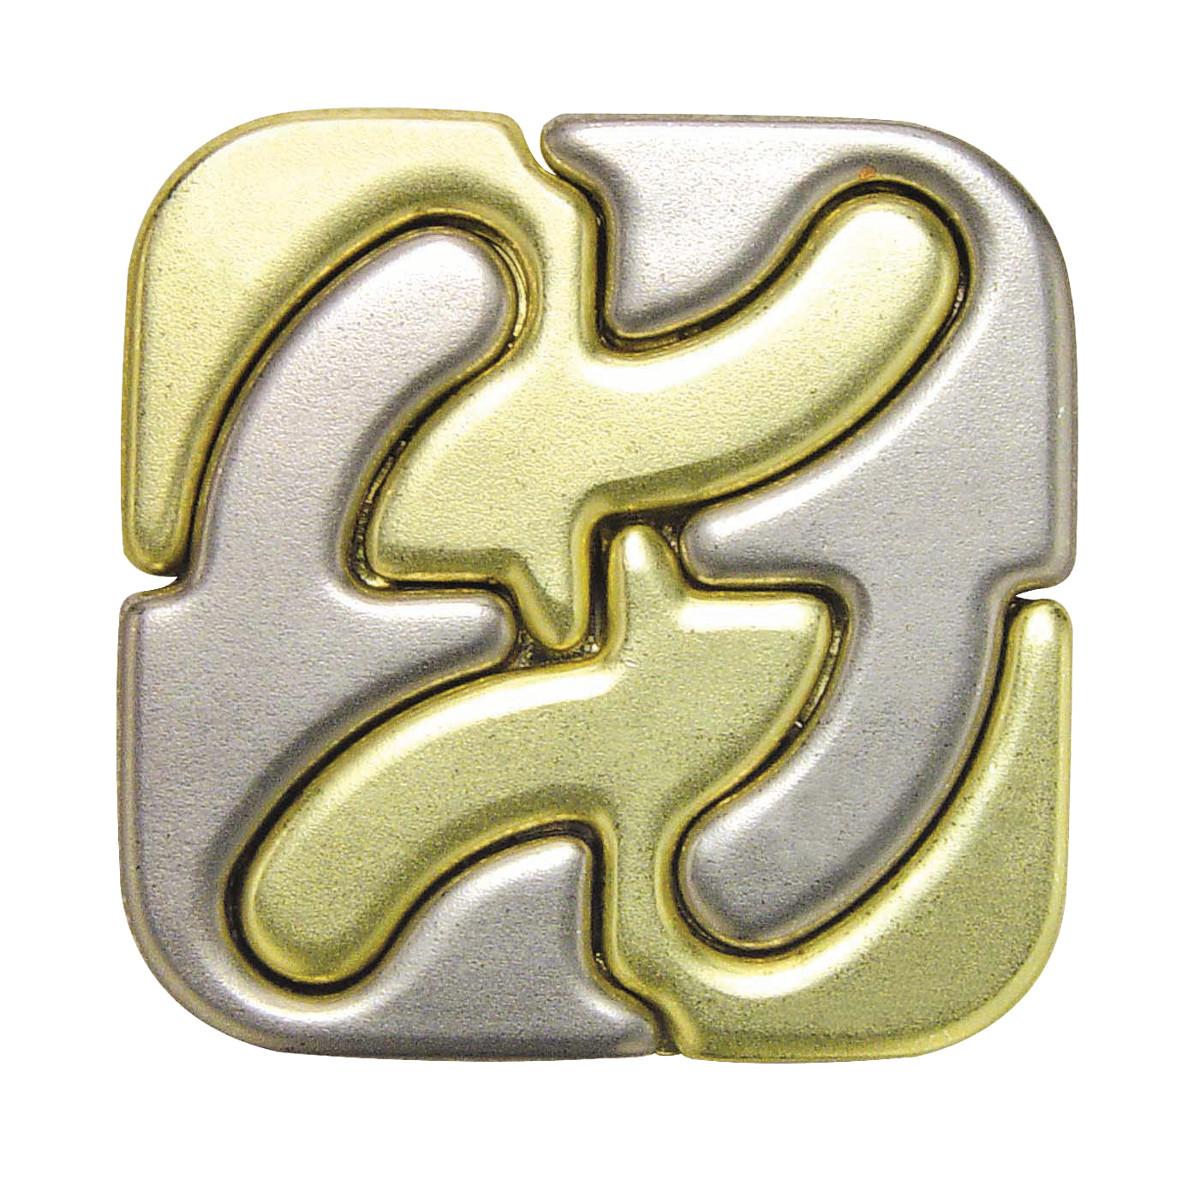 Hanayama -  Square Puzzle Brain Teaser